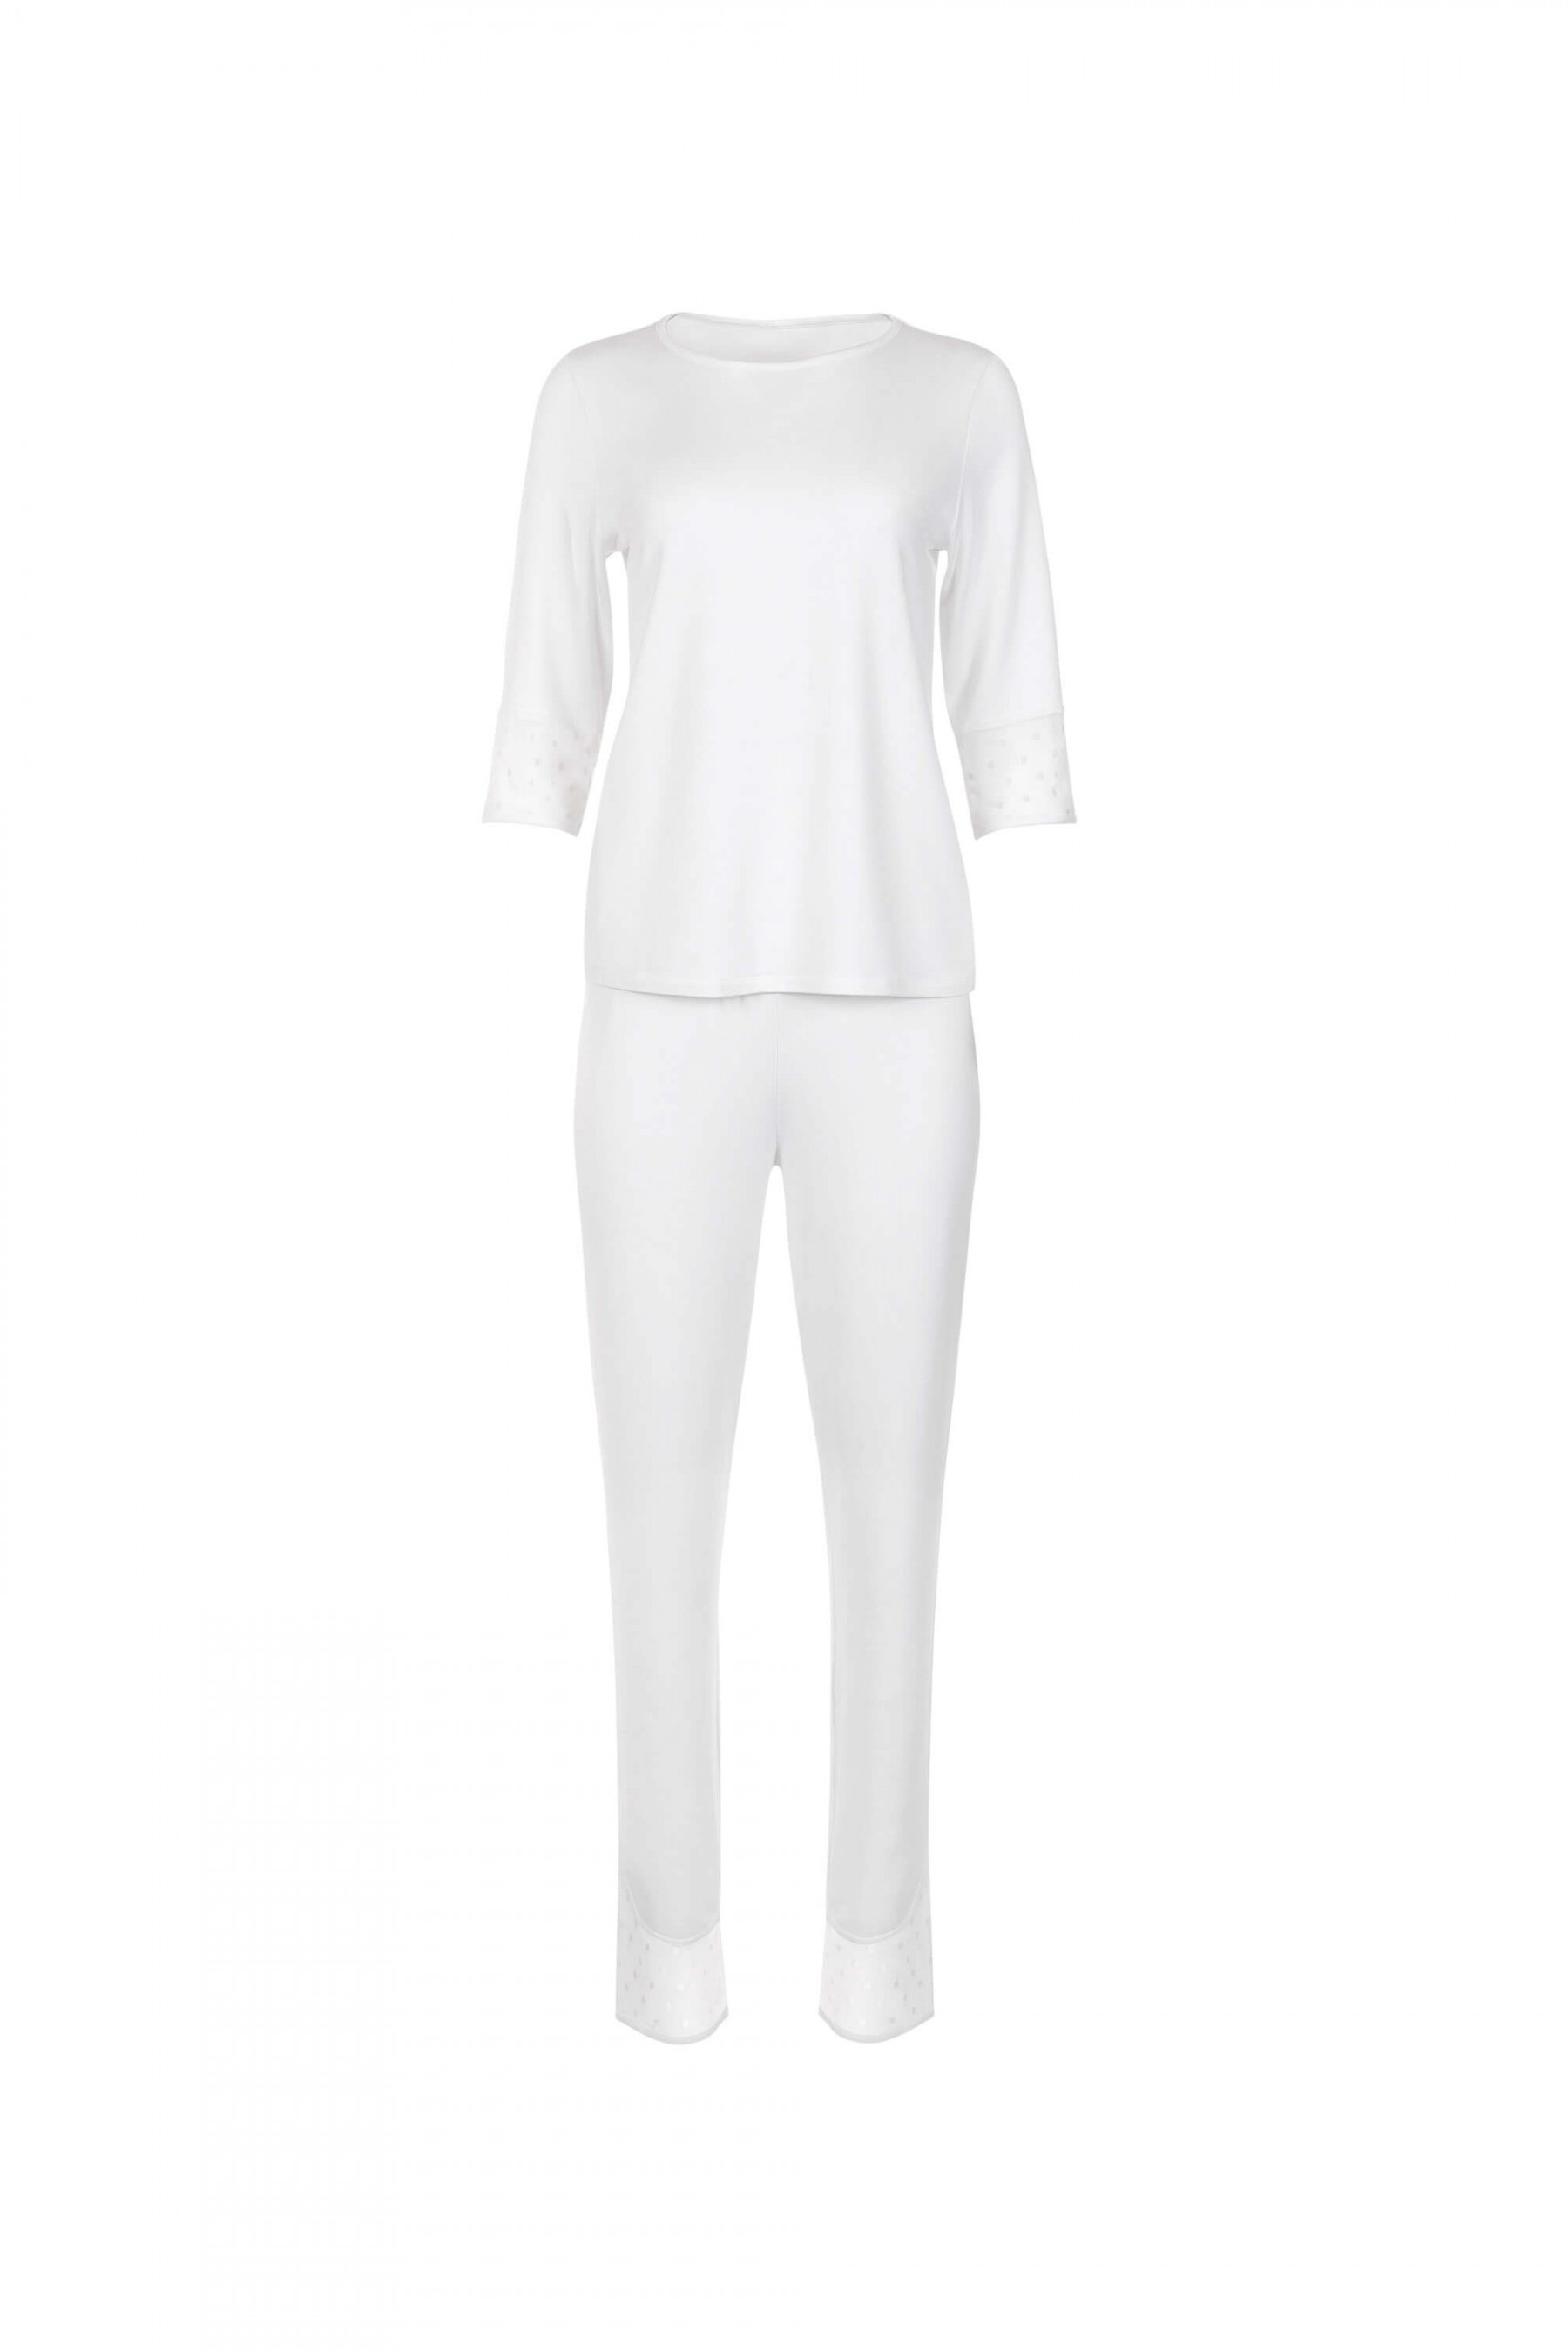 63409 - »Romance« 3/4 Sleeve Top and Long Bottoms Pyjamas